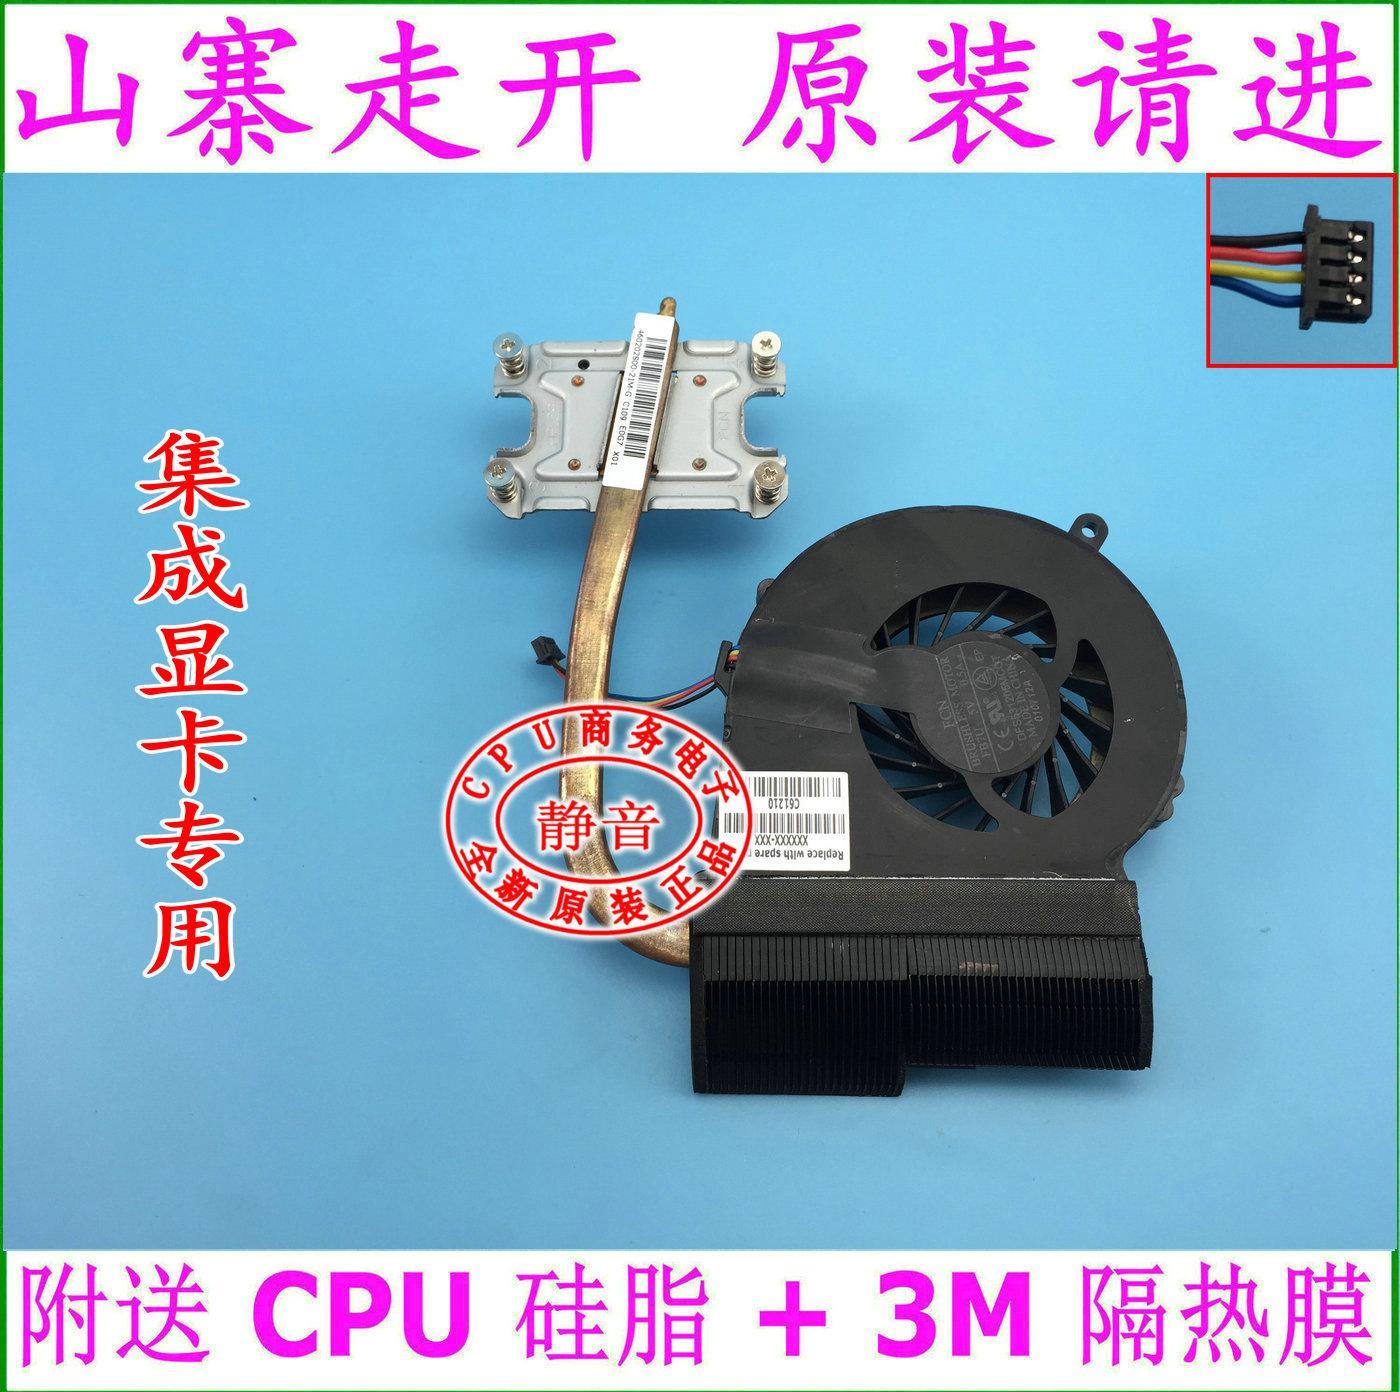 enfriador para HP 2000 CQ58 650 disipador térmico de refrigeración con ventilador 686259-001